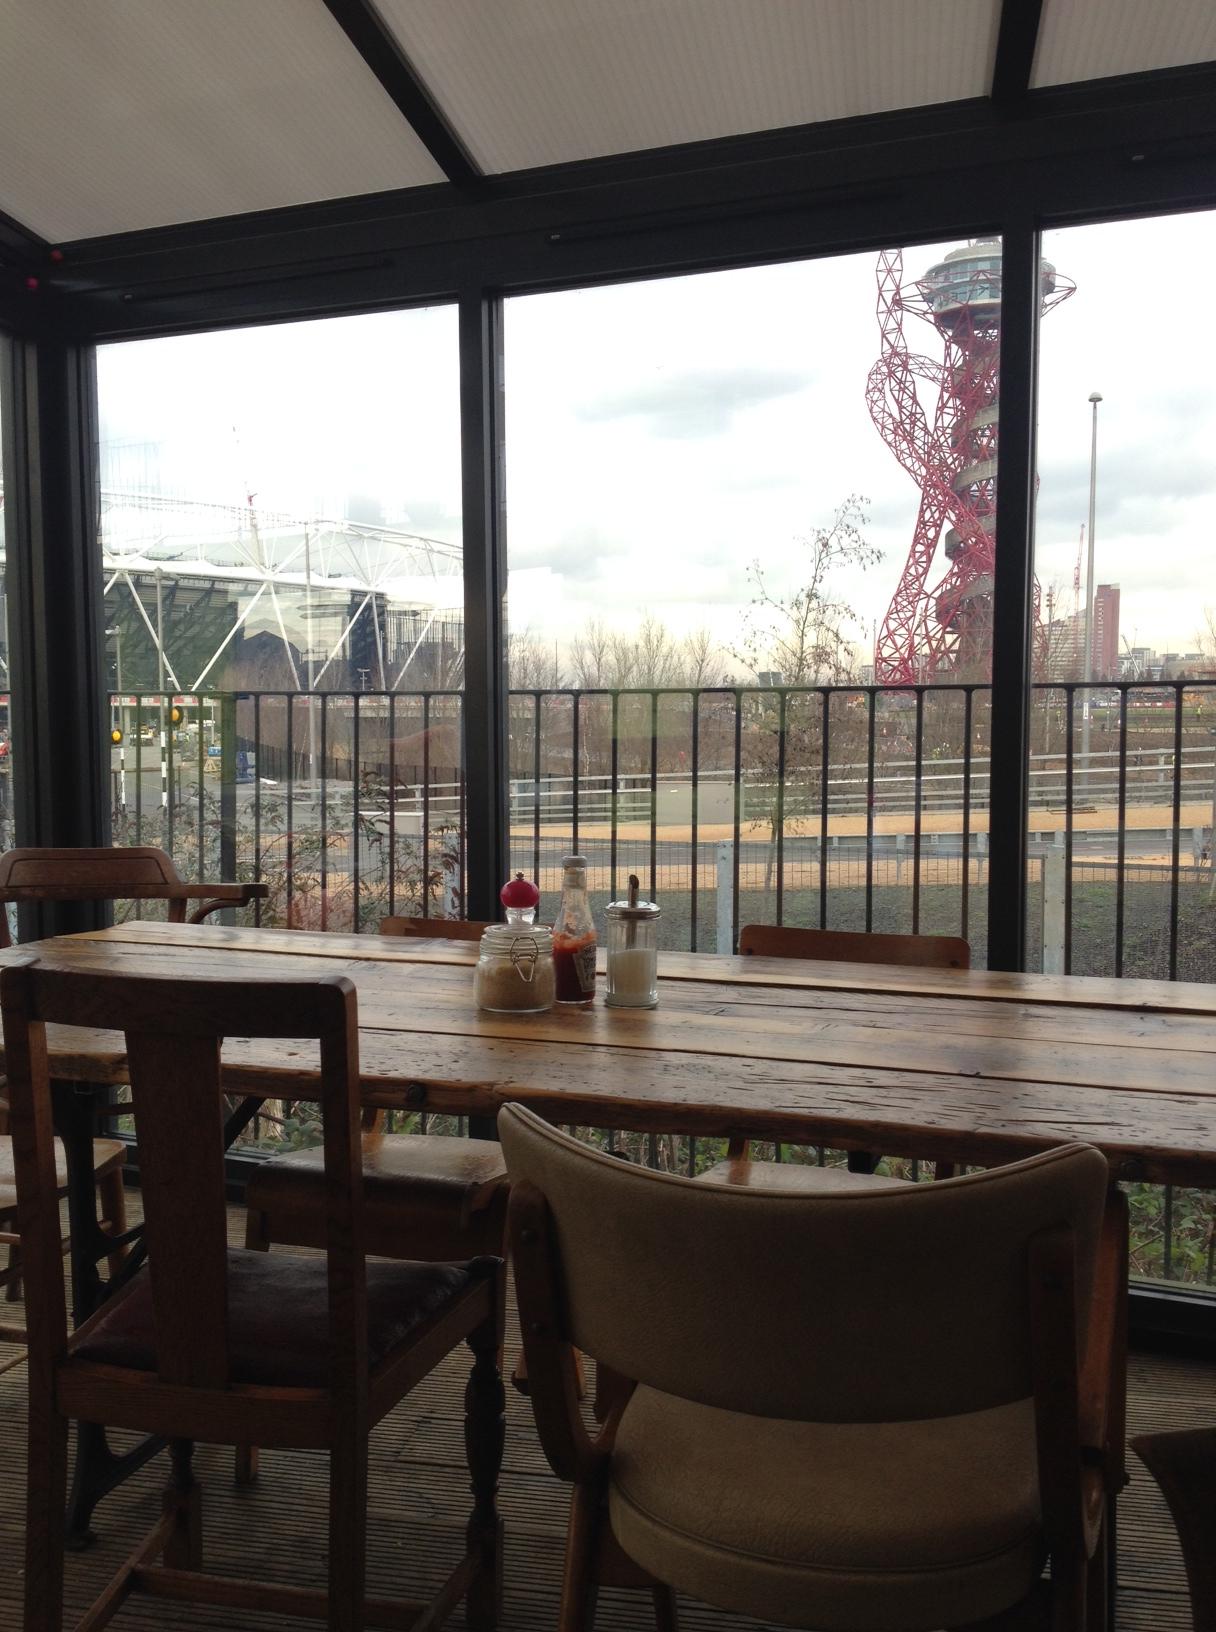 cafe olympic park moka east stratford view tube london